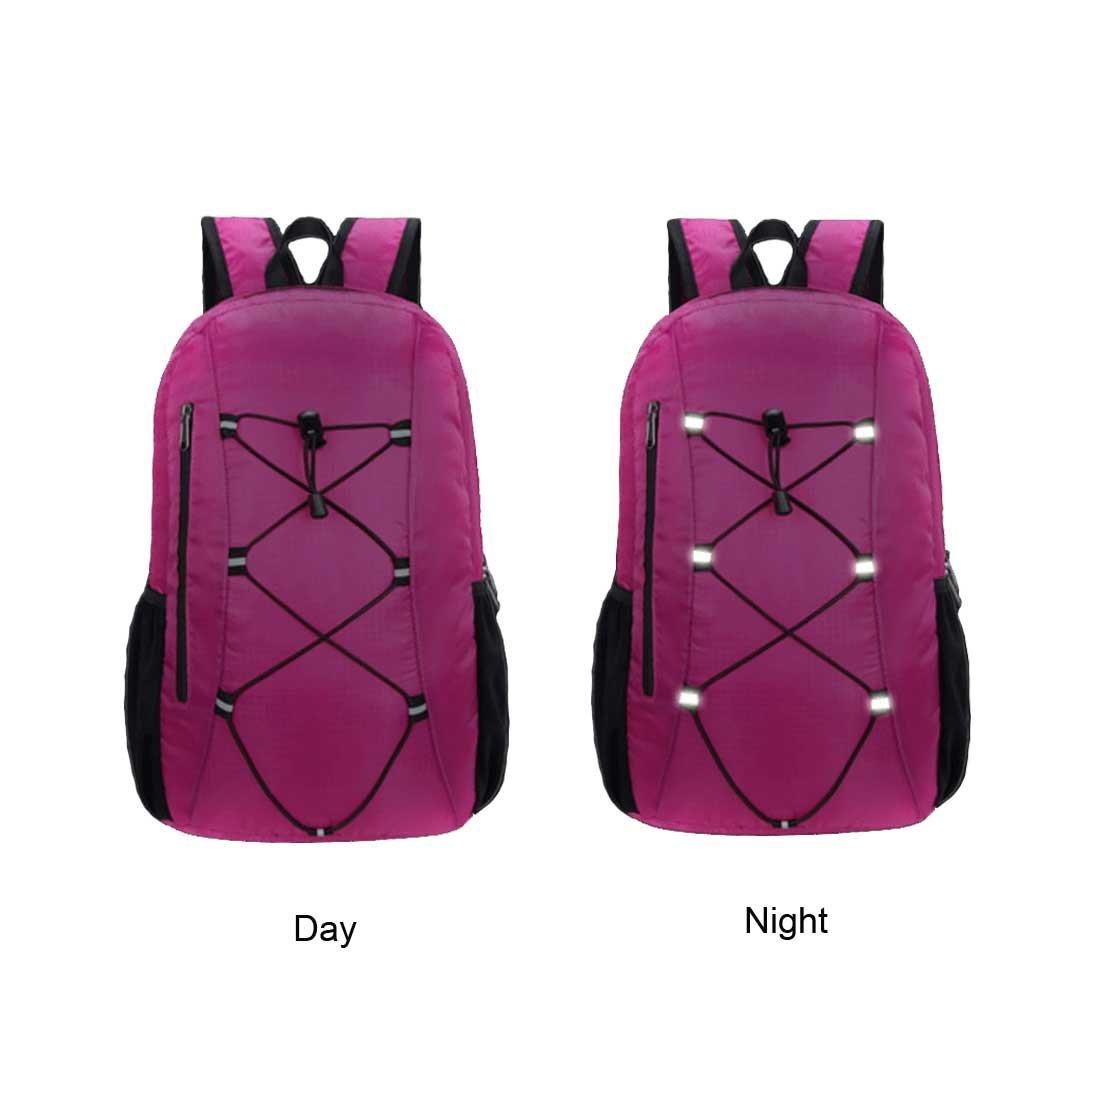 Foldable Backpack Lightweight Waterproof Travel Packable Hiking Daypack